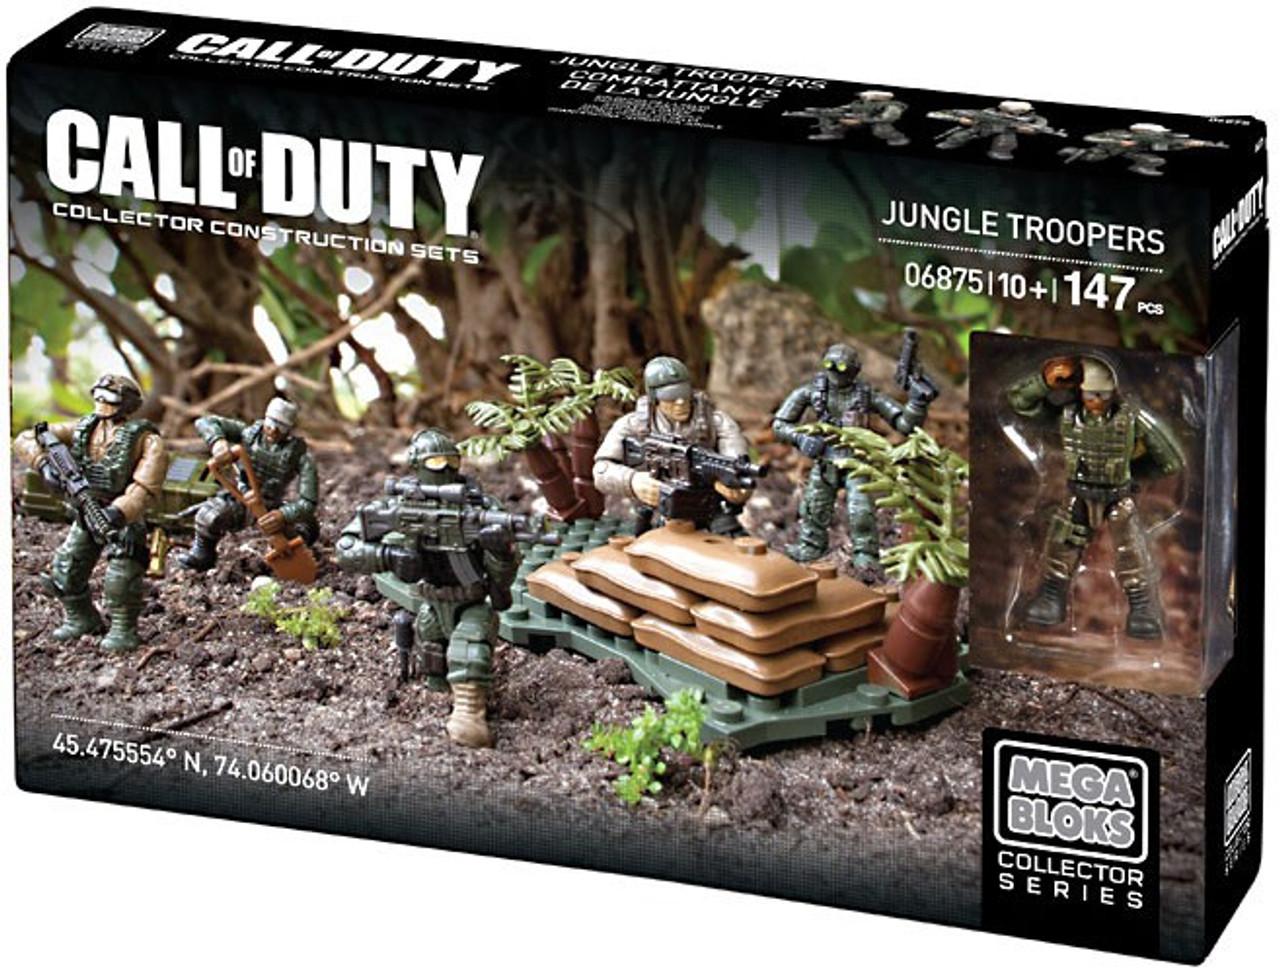 Mega Bloks Call of Duty Jungle Troopers Set #06875